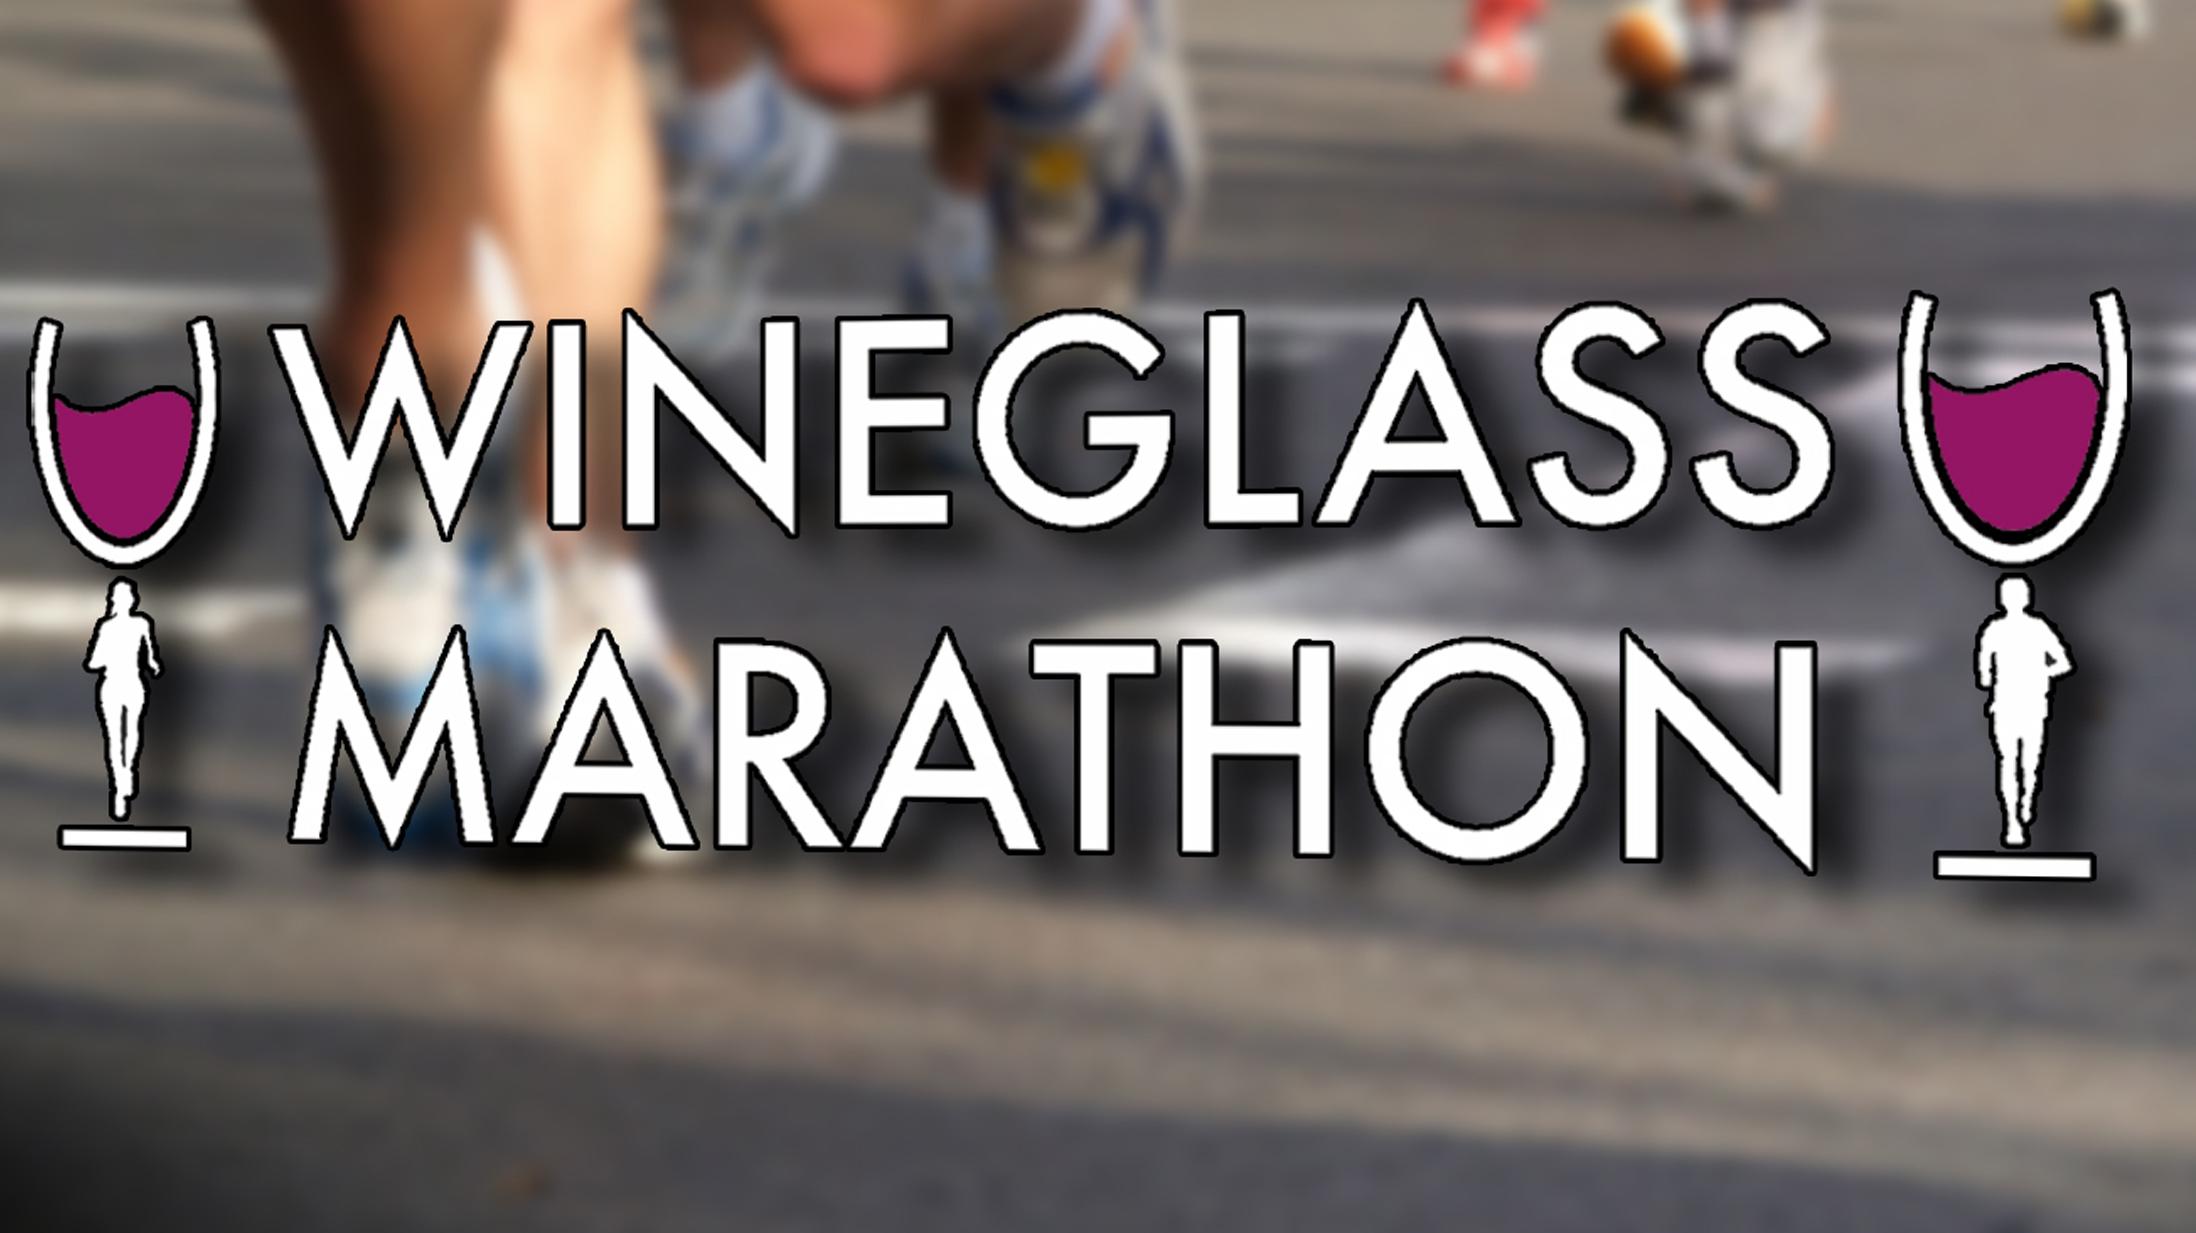 Wineglass Marathon.jpg